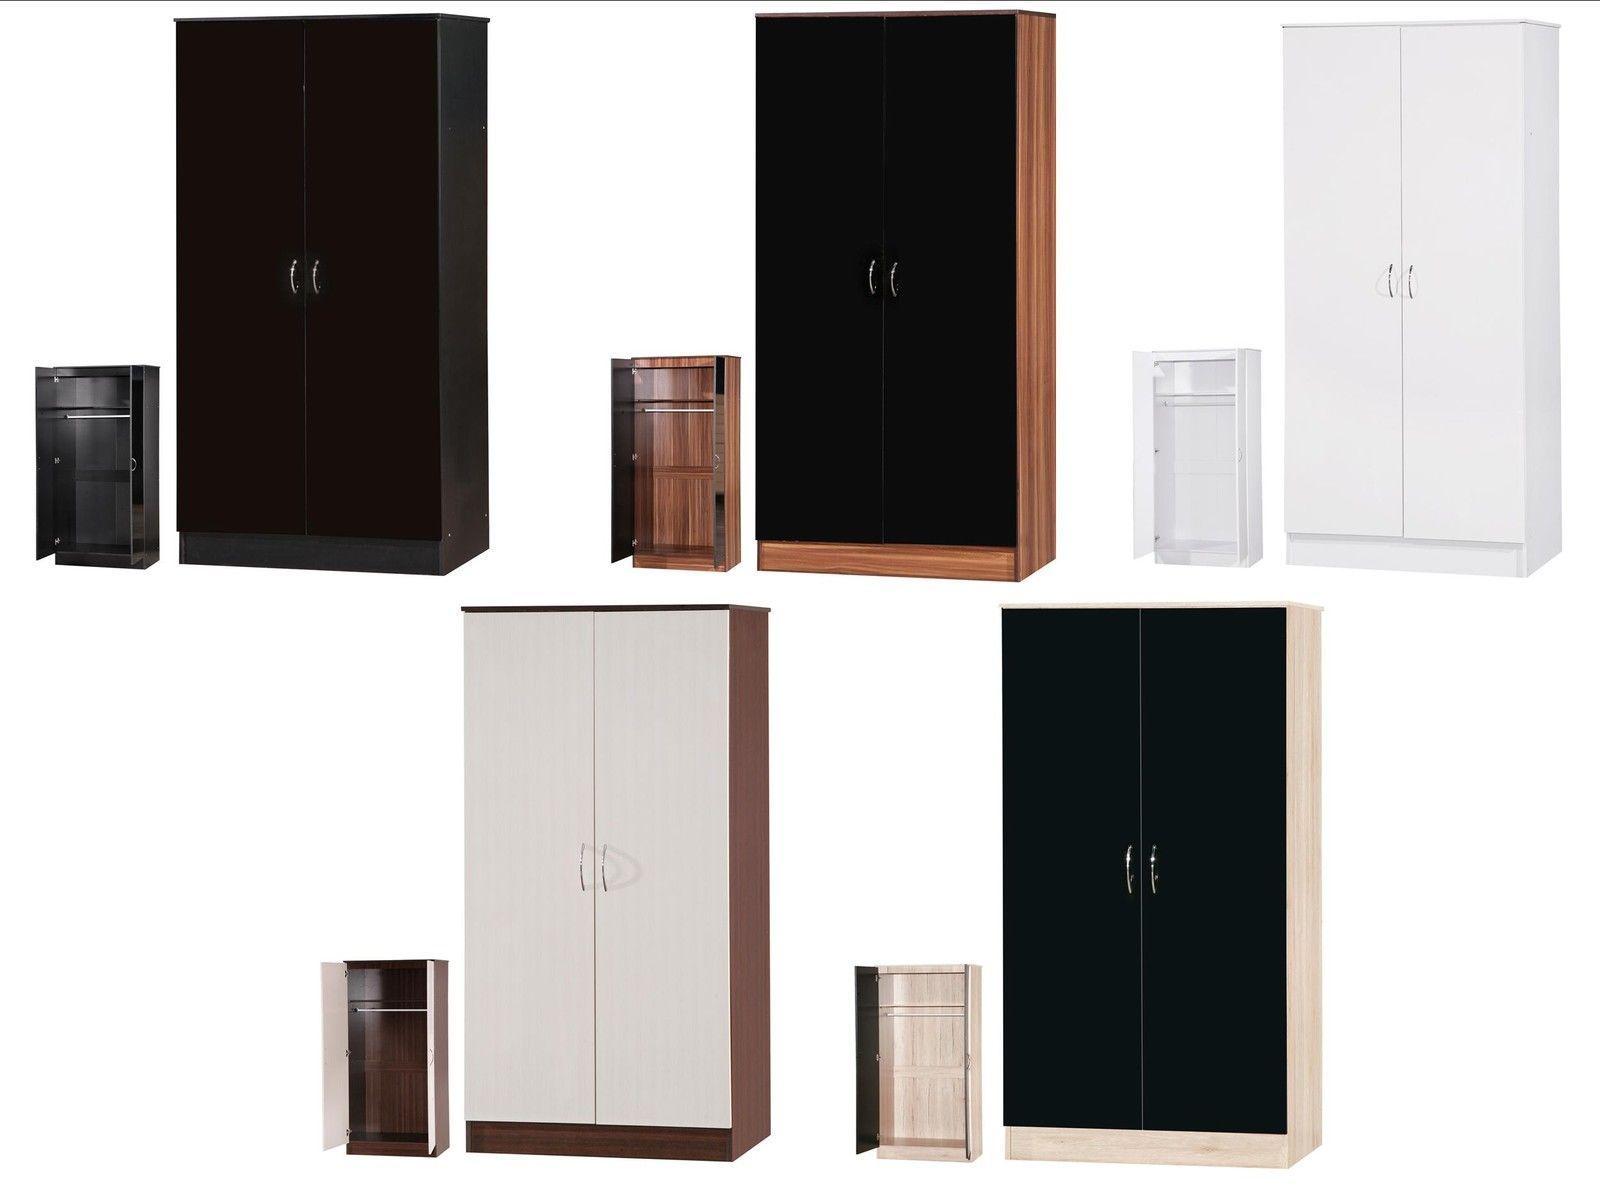 Alpha High Gloss Wardrobes 2 Or 3 Door Mirrored Or Sliding Bedroom Furniture Ebay